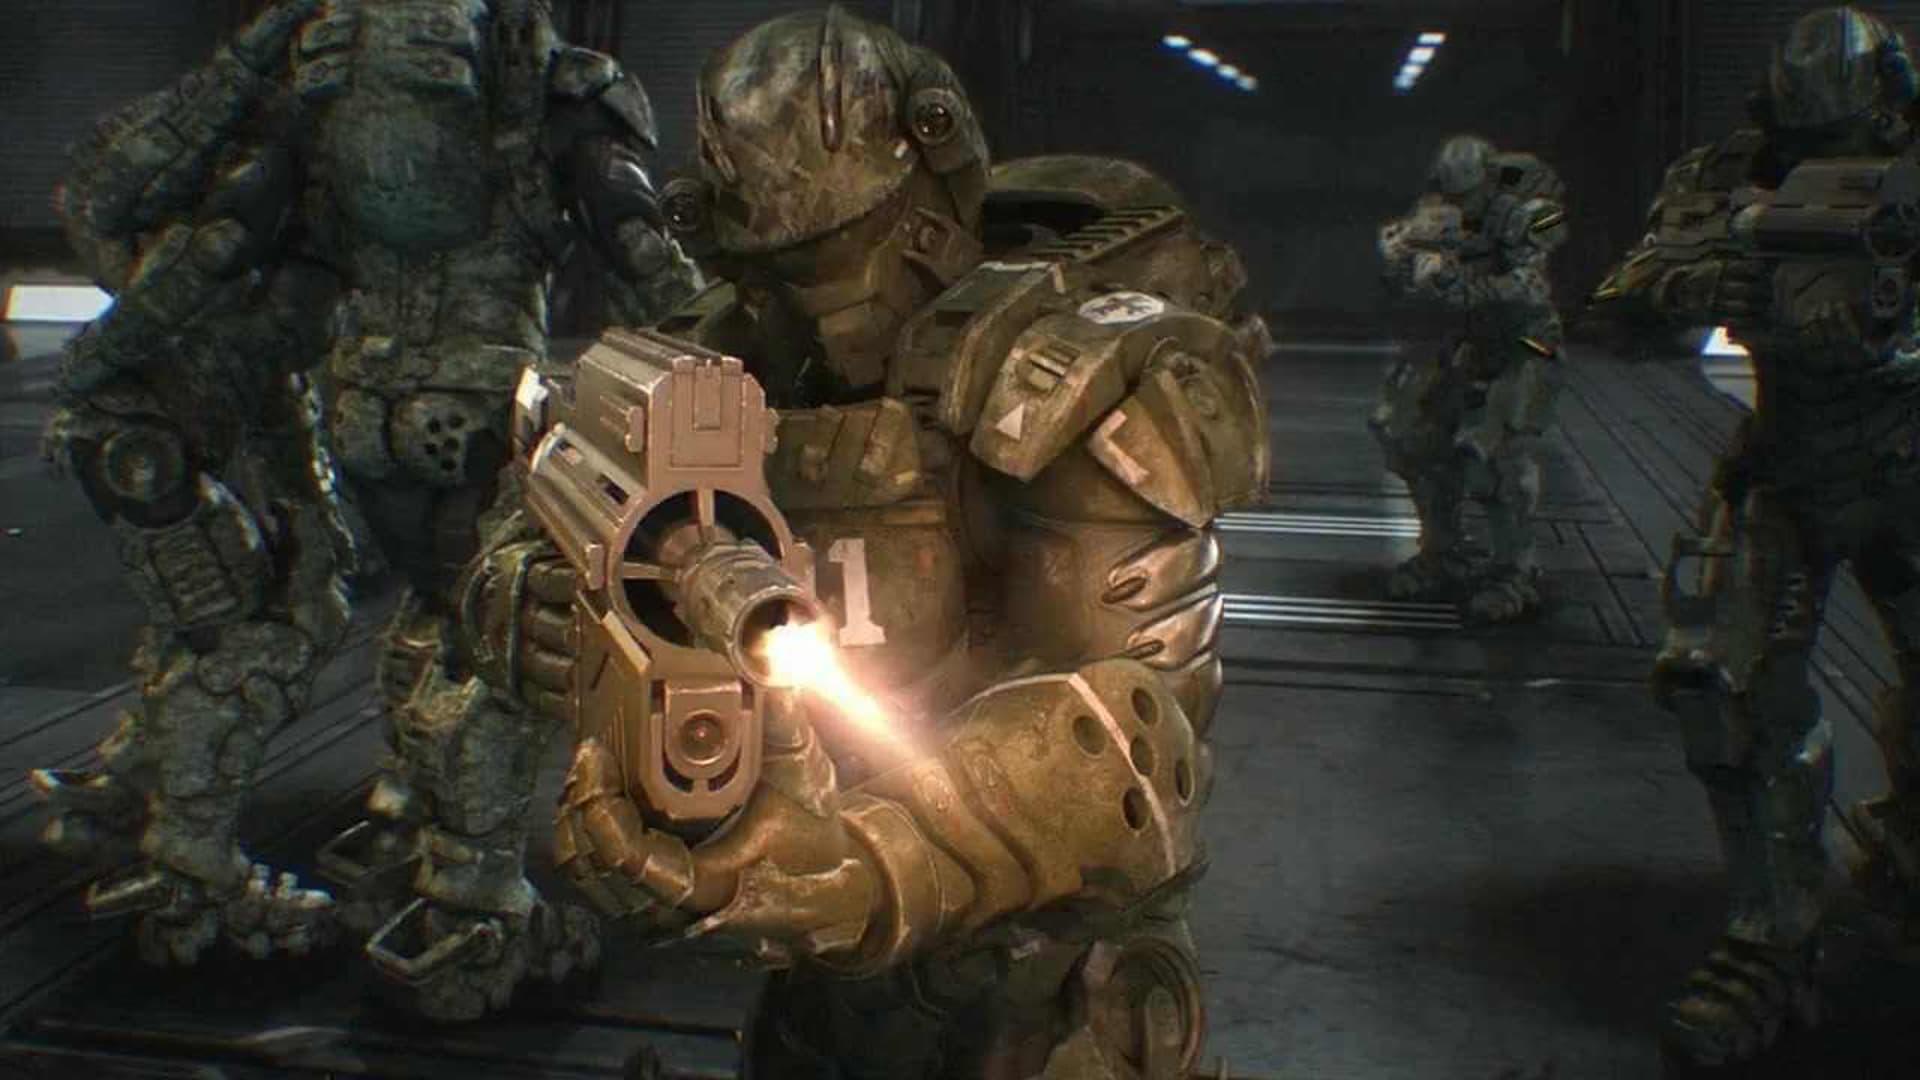 Regarder Starship Troopers: Invasion en streaming gratuit